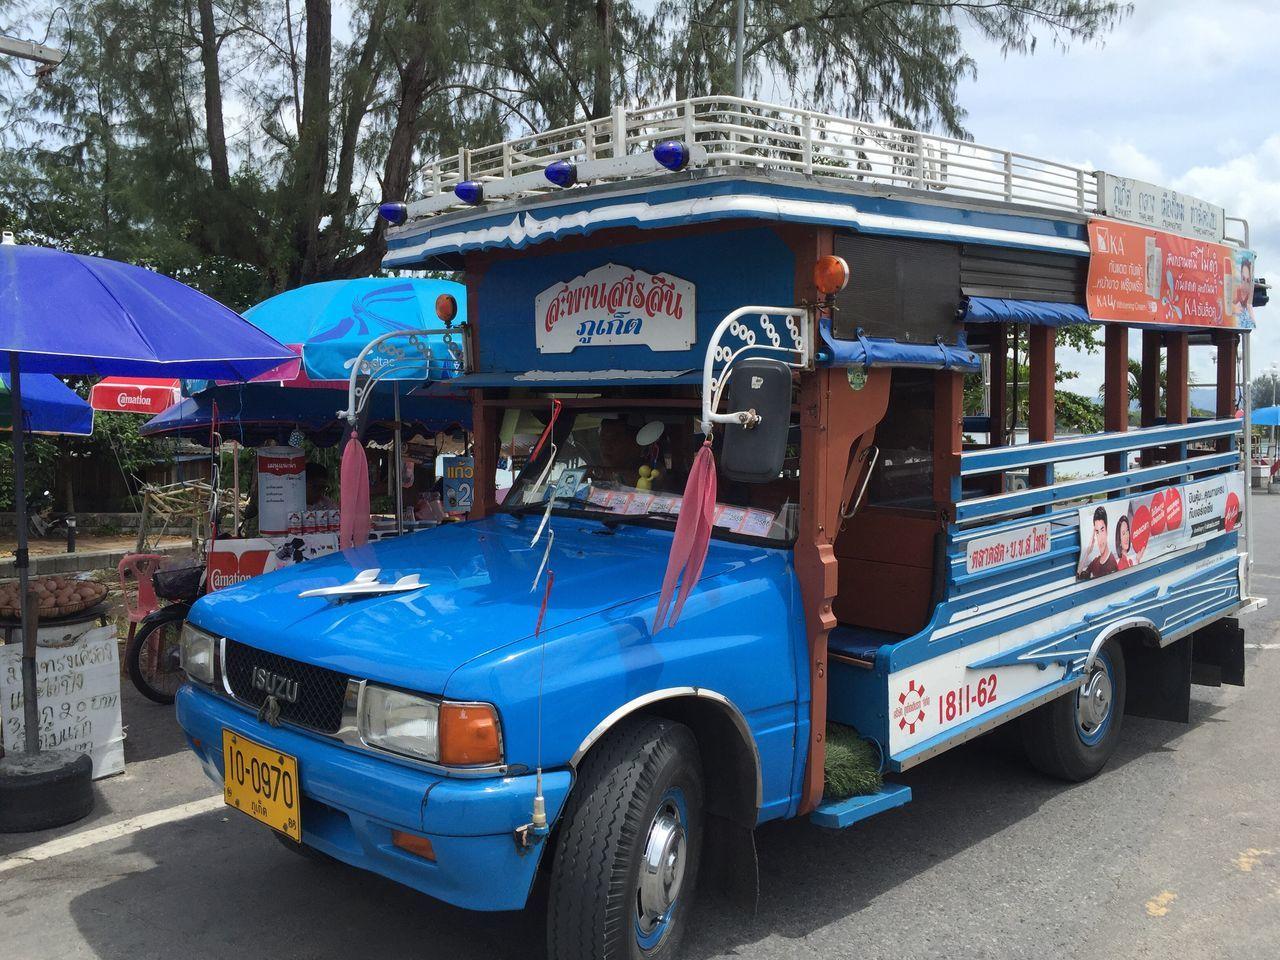 Old Isuzu local bus in Phuket Town Phuket Phuket Town Bus Oldbus Isuzu Soungthaew Thailand Phuket Old Town Sarasin Bridge Travelleryt Traveling Wanderlust Couple Thailand.. EyeMe Bestshot Insta_thailand Thai Souththailand We ❤️ Thailand